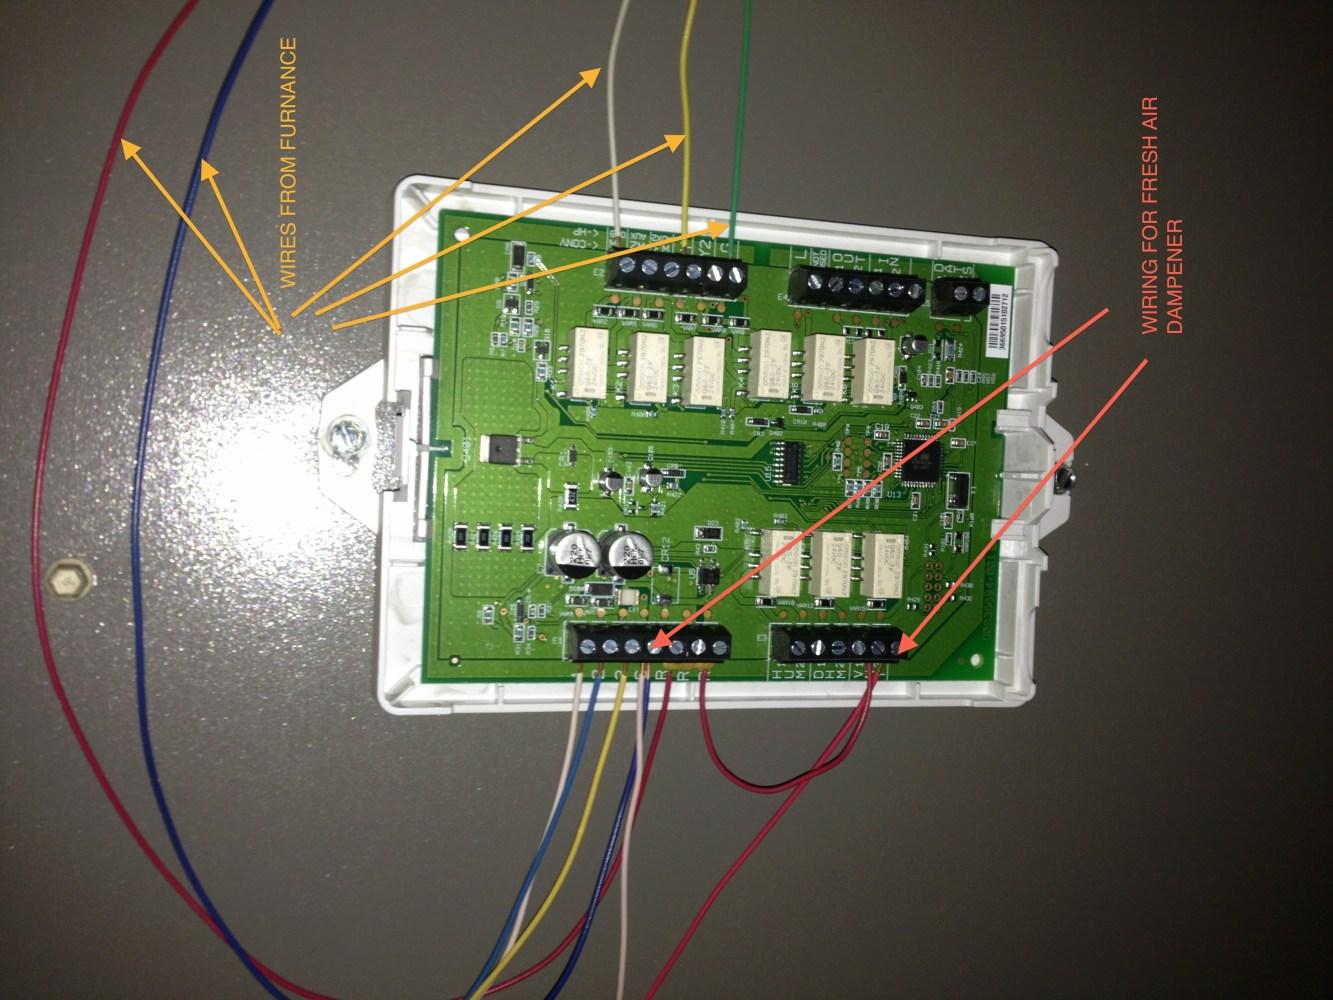 medium resolution of wiring diagram for honeywell thermostat t410 honeywell eim auto eim tec2 wiring diagram eim wiring diagram